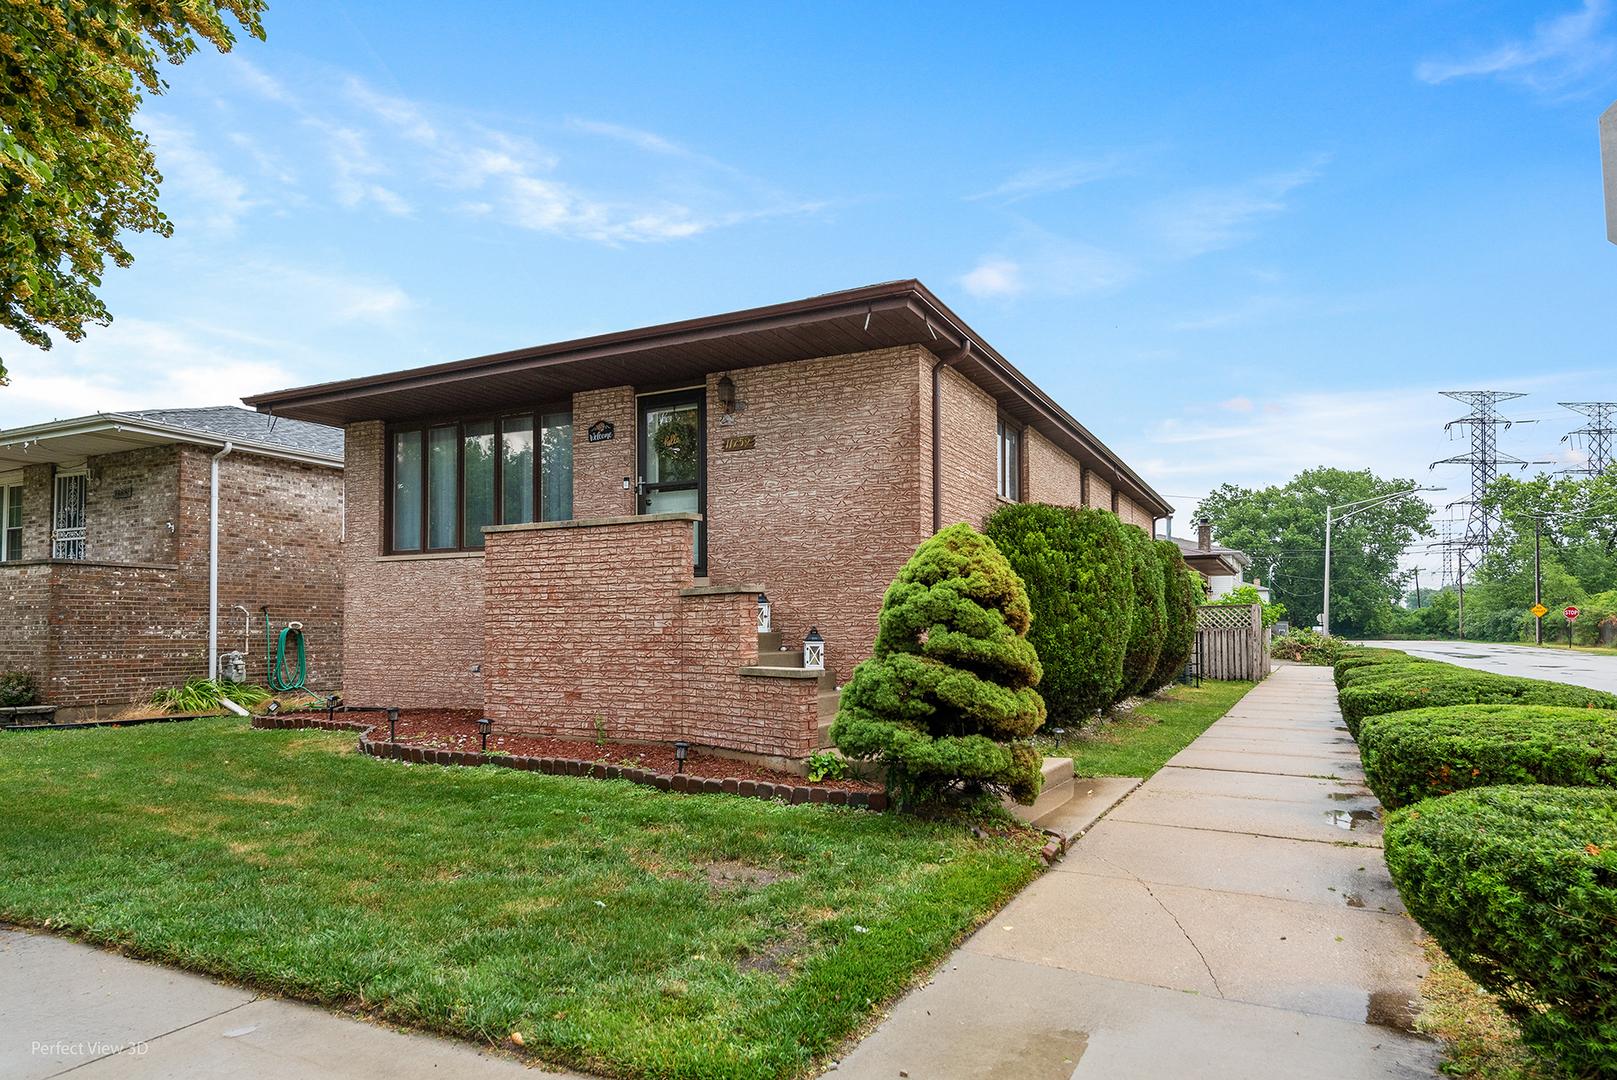 11759 Ewing ,Chicago, Illinois 60617